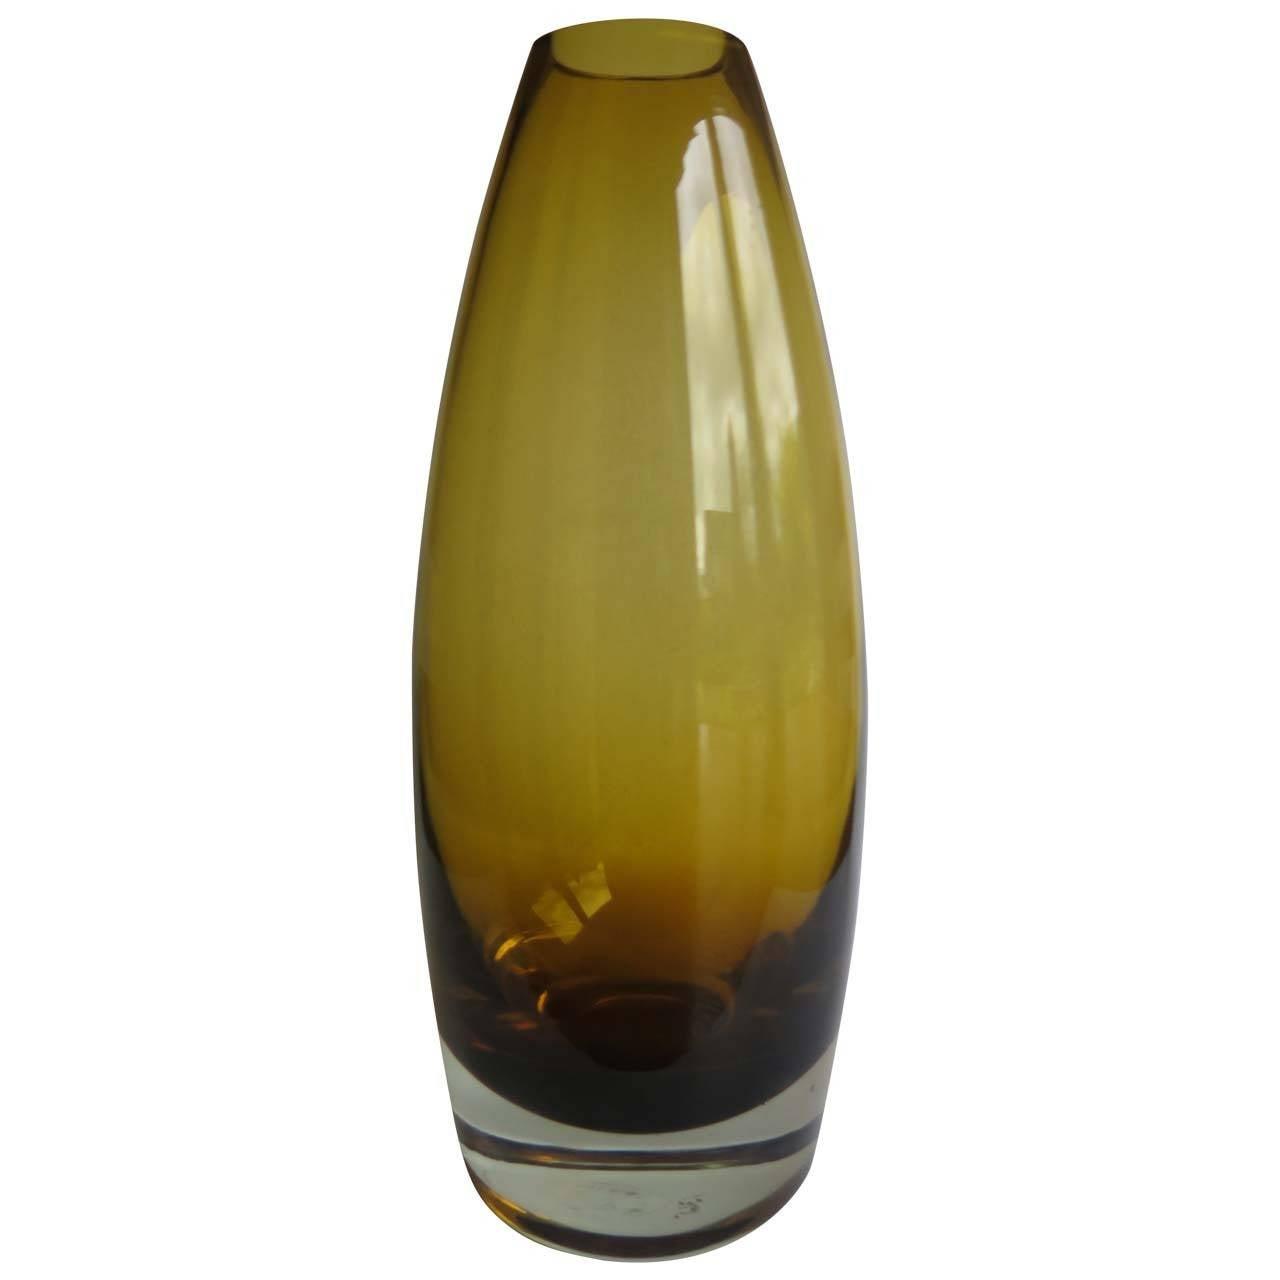 Finnish riihimaki art glass vase riihimaen lasi oy cased yellow finnish riihimaki art glass vase riihimaen lasi oy cased yellow 1960s for reviewsmspy